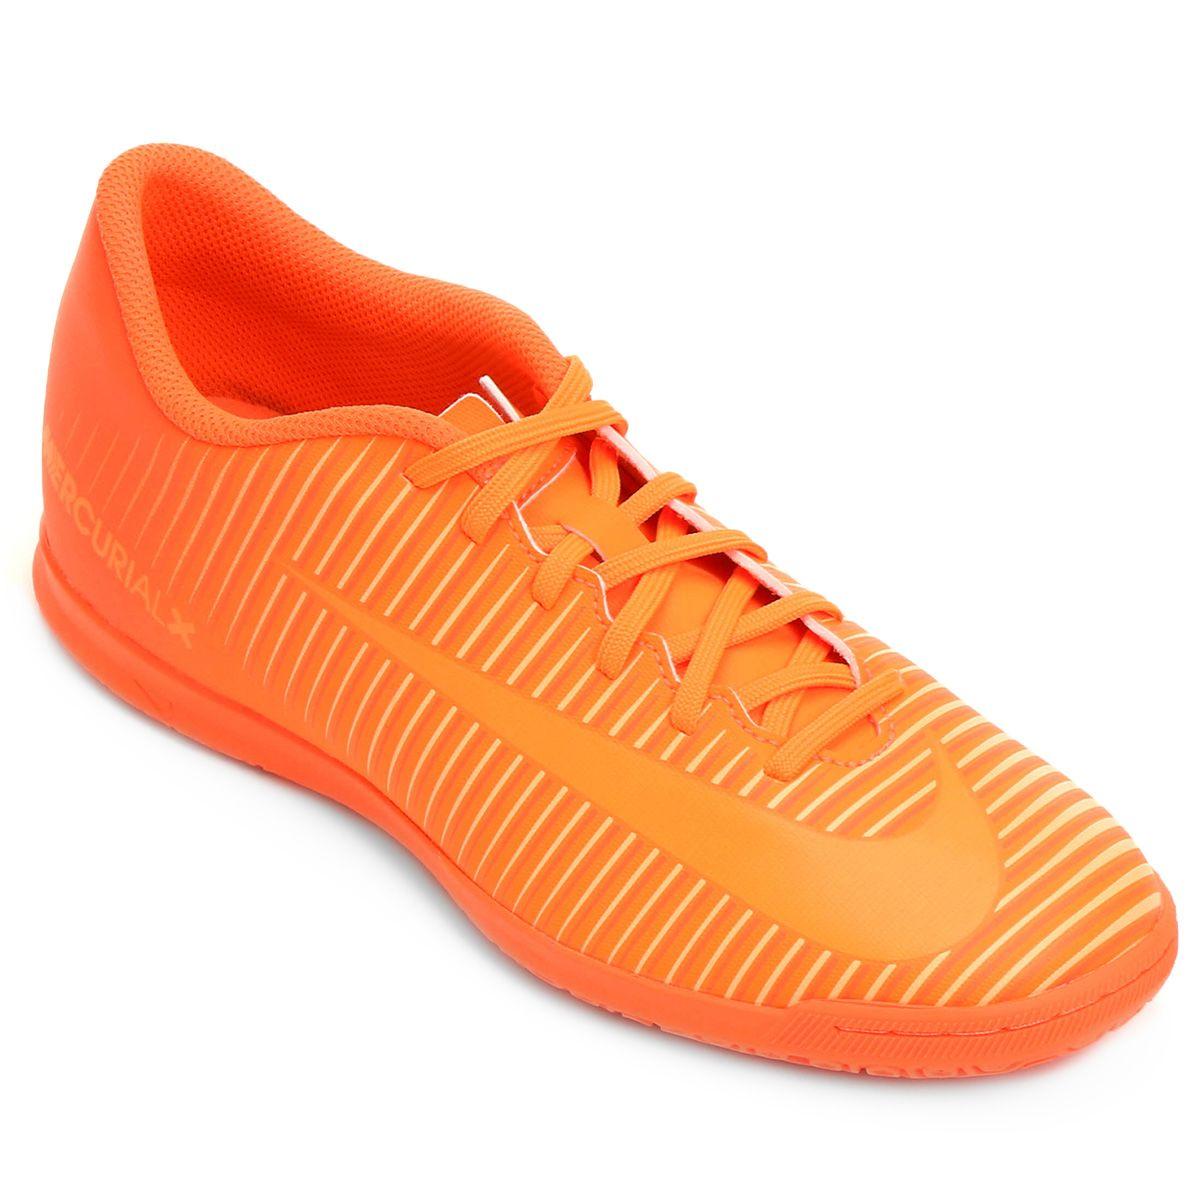 9afc41be8e0 Chuteira Futsal Nike Mercurial Vortex 3 IC - Laranja